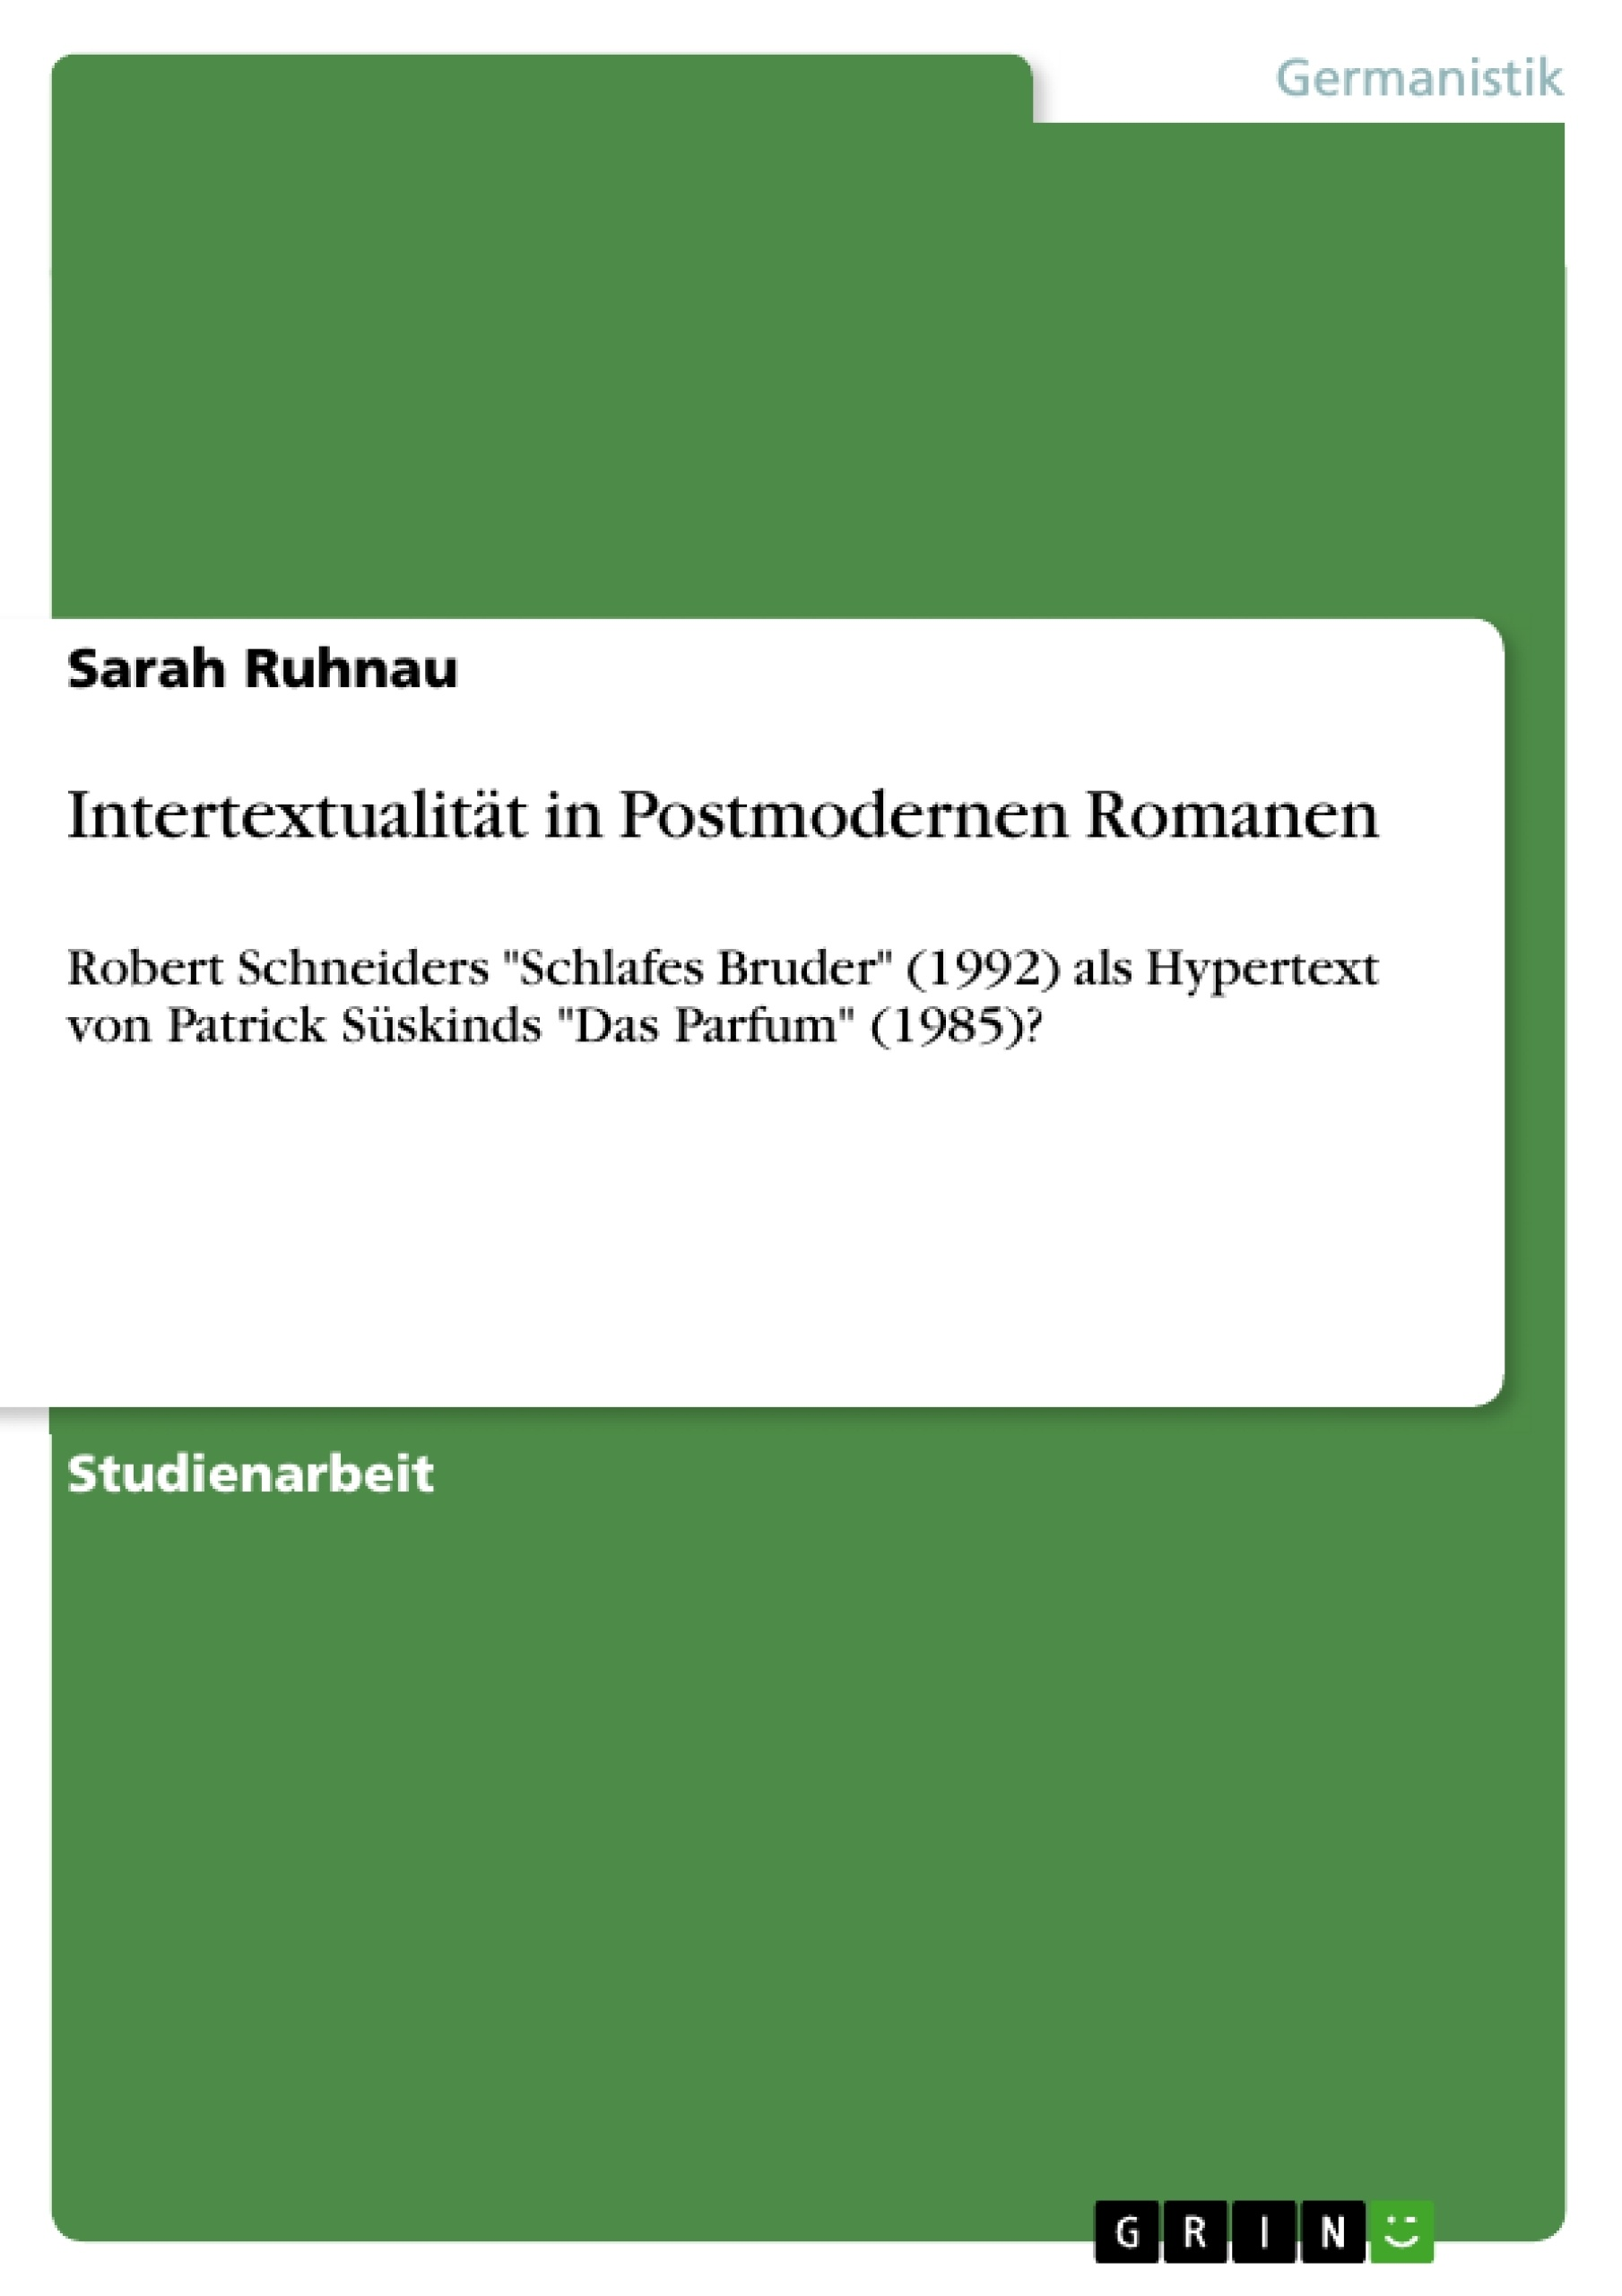 Titel: Intertextualität in Postmodernen Romanen